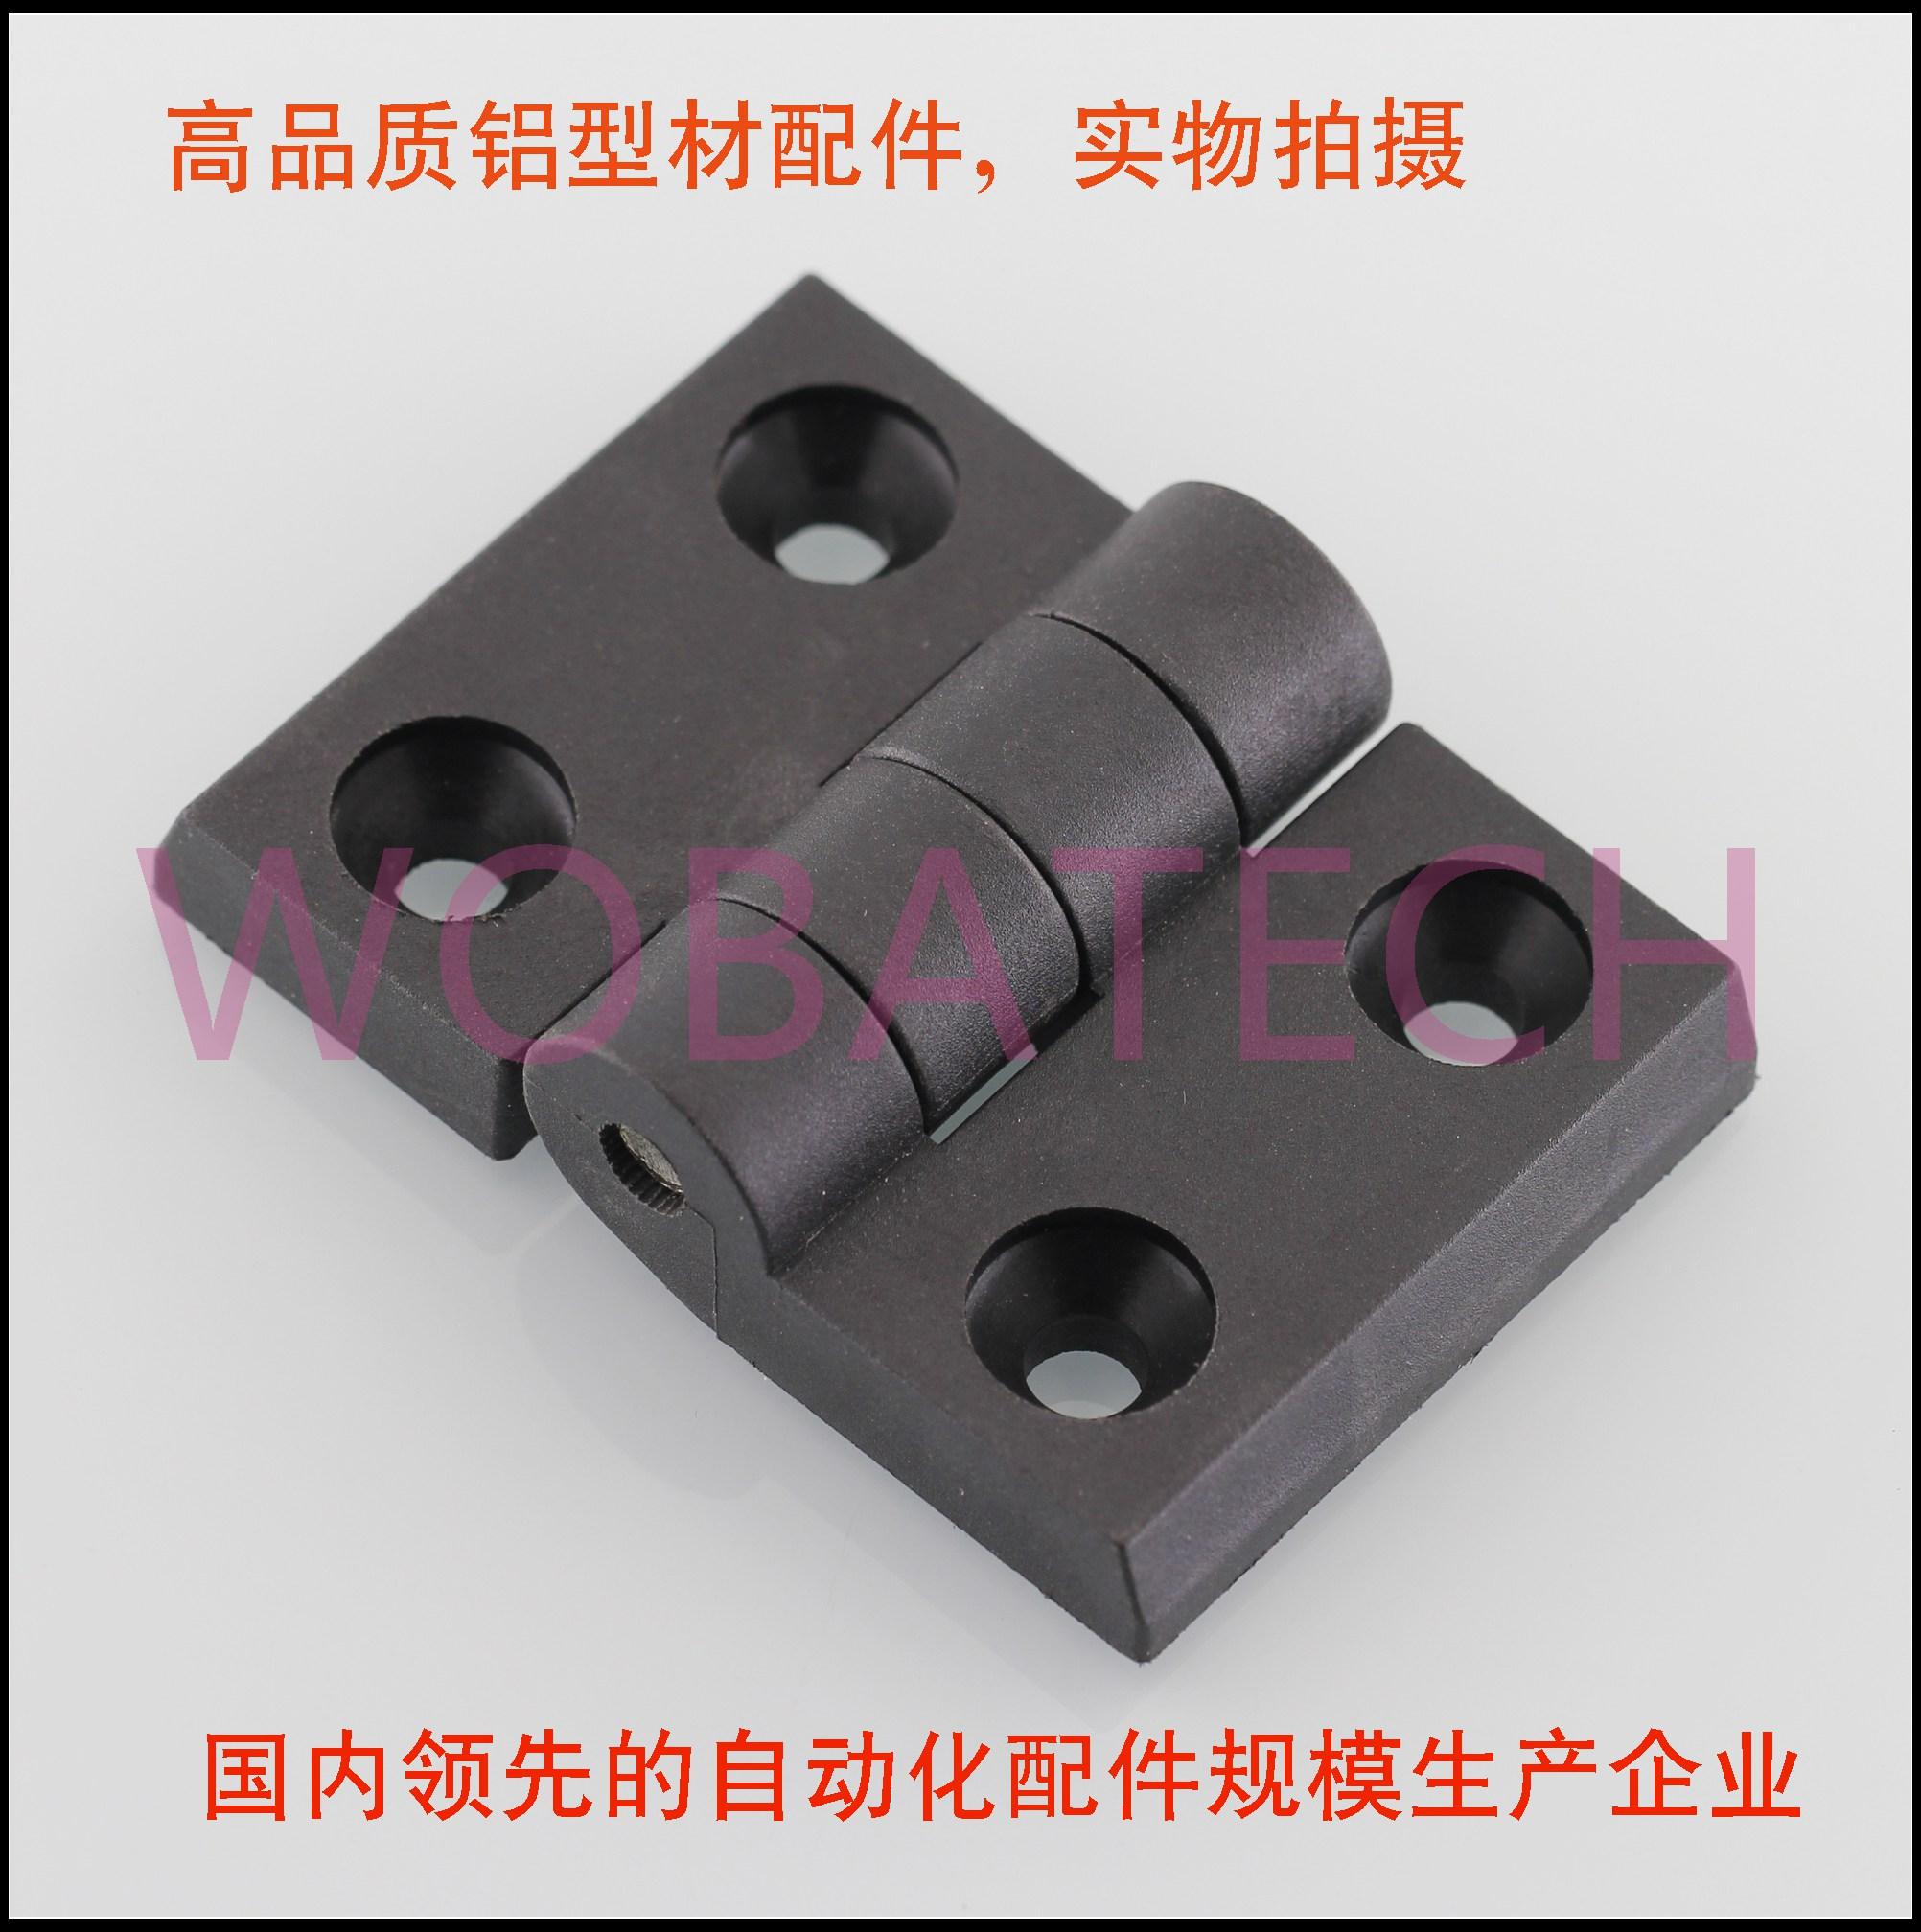 4545 slot 10 series aluminum profile accessories, reinforced nylon plastic, non removable hinge 45Hinge-V